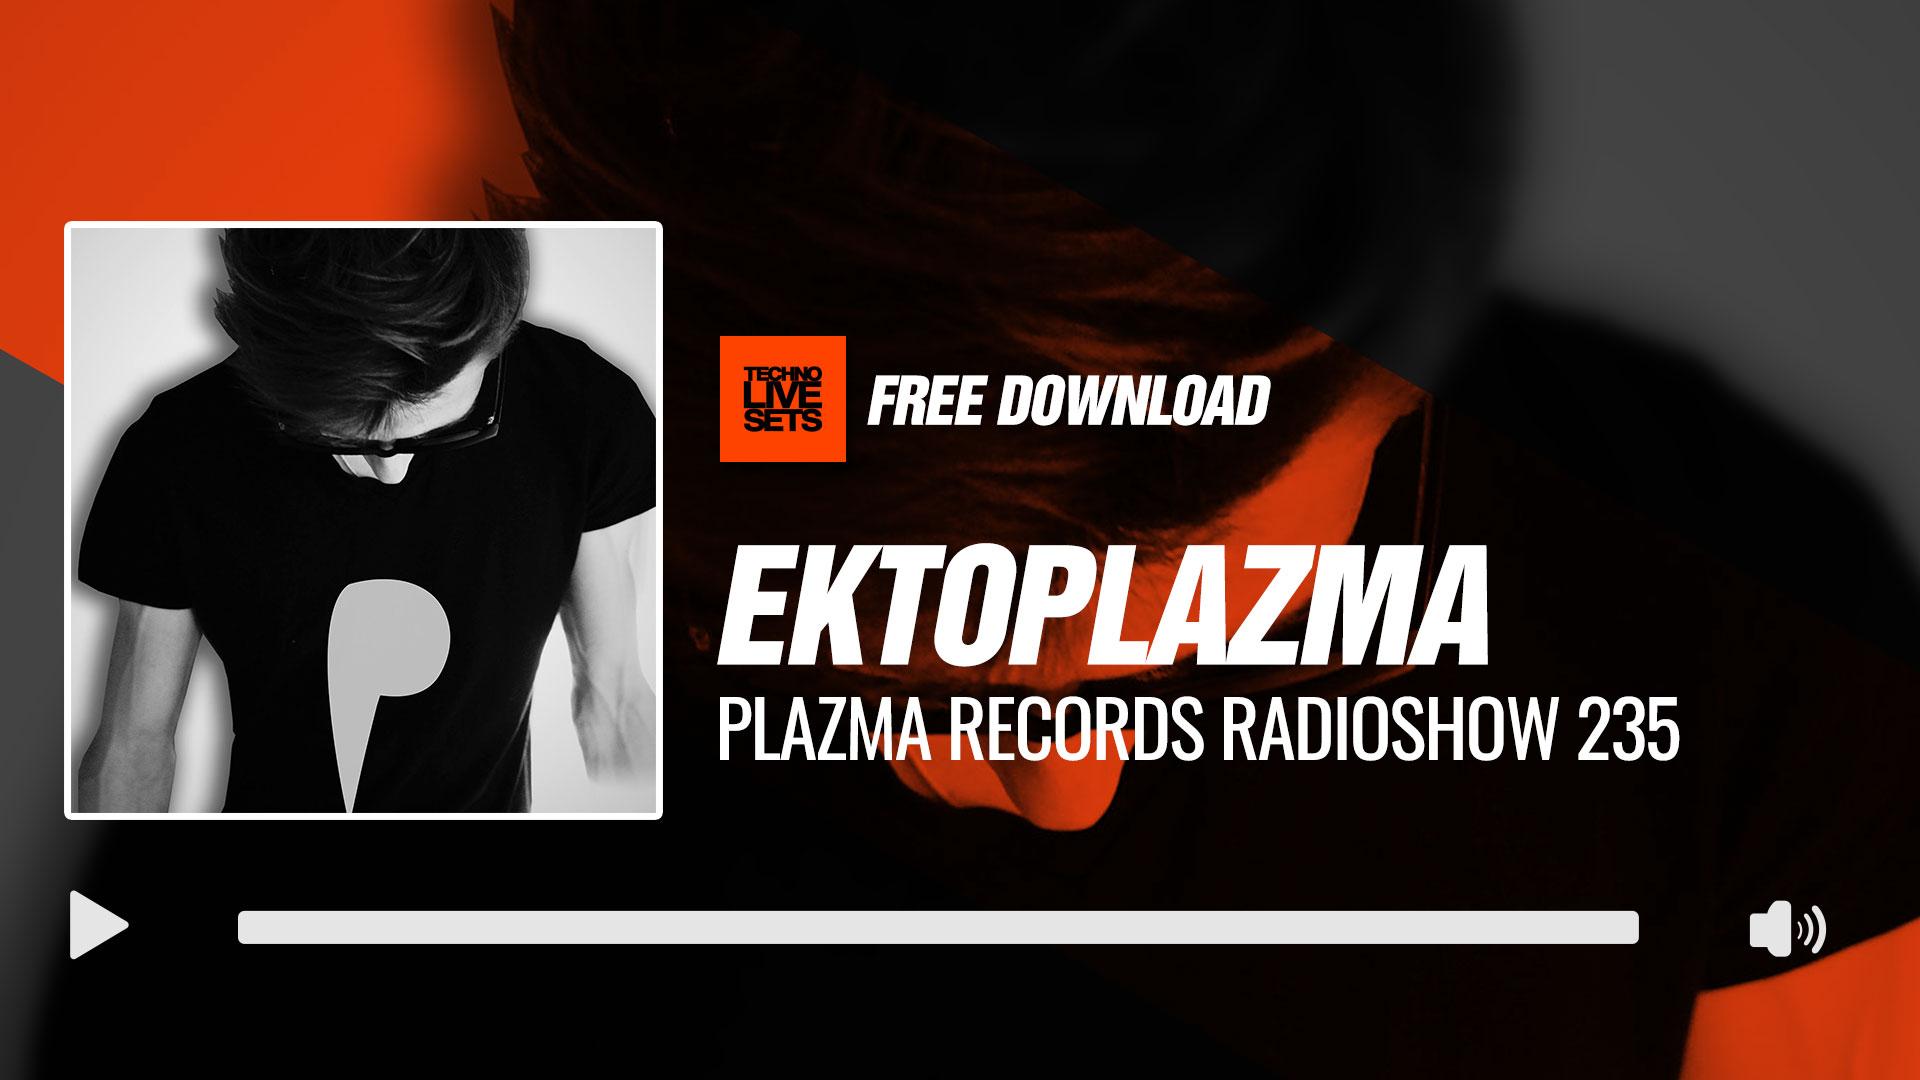 Ektoplazma 2017 plazma records radioshow 235 06 08 2017 for Canape trossingen